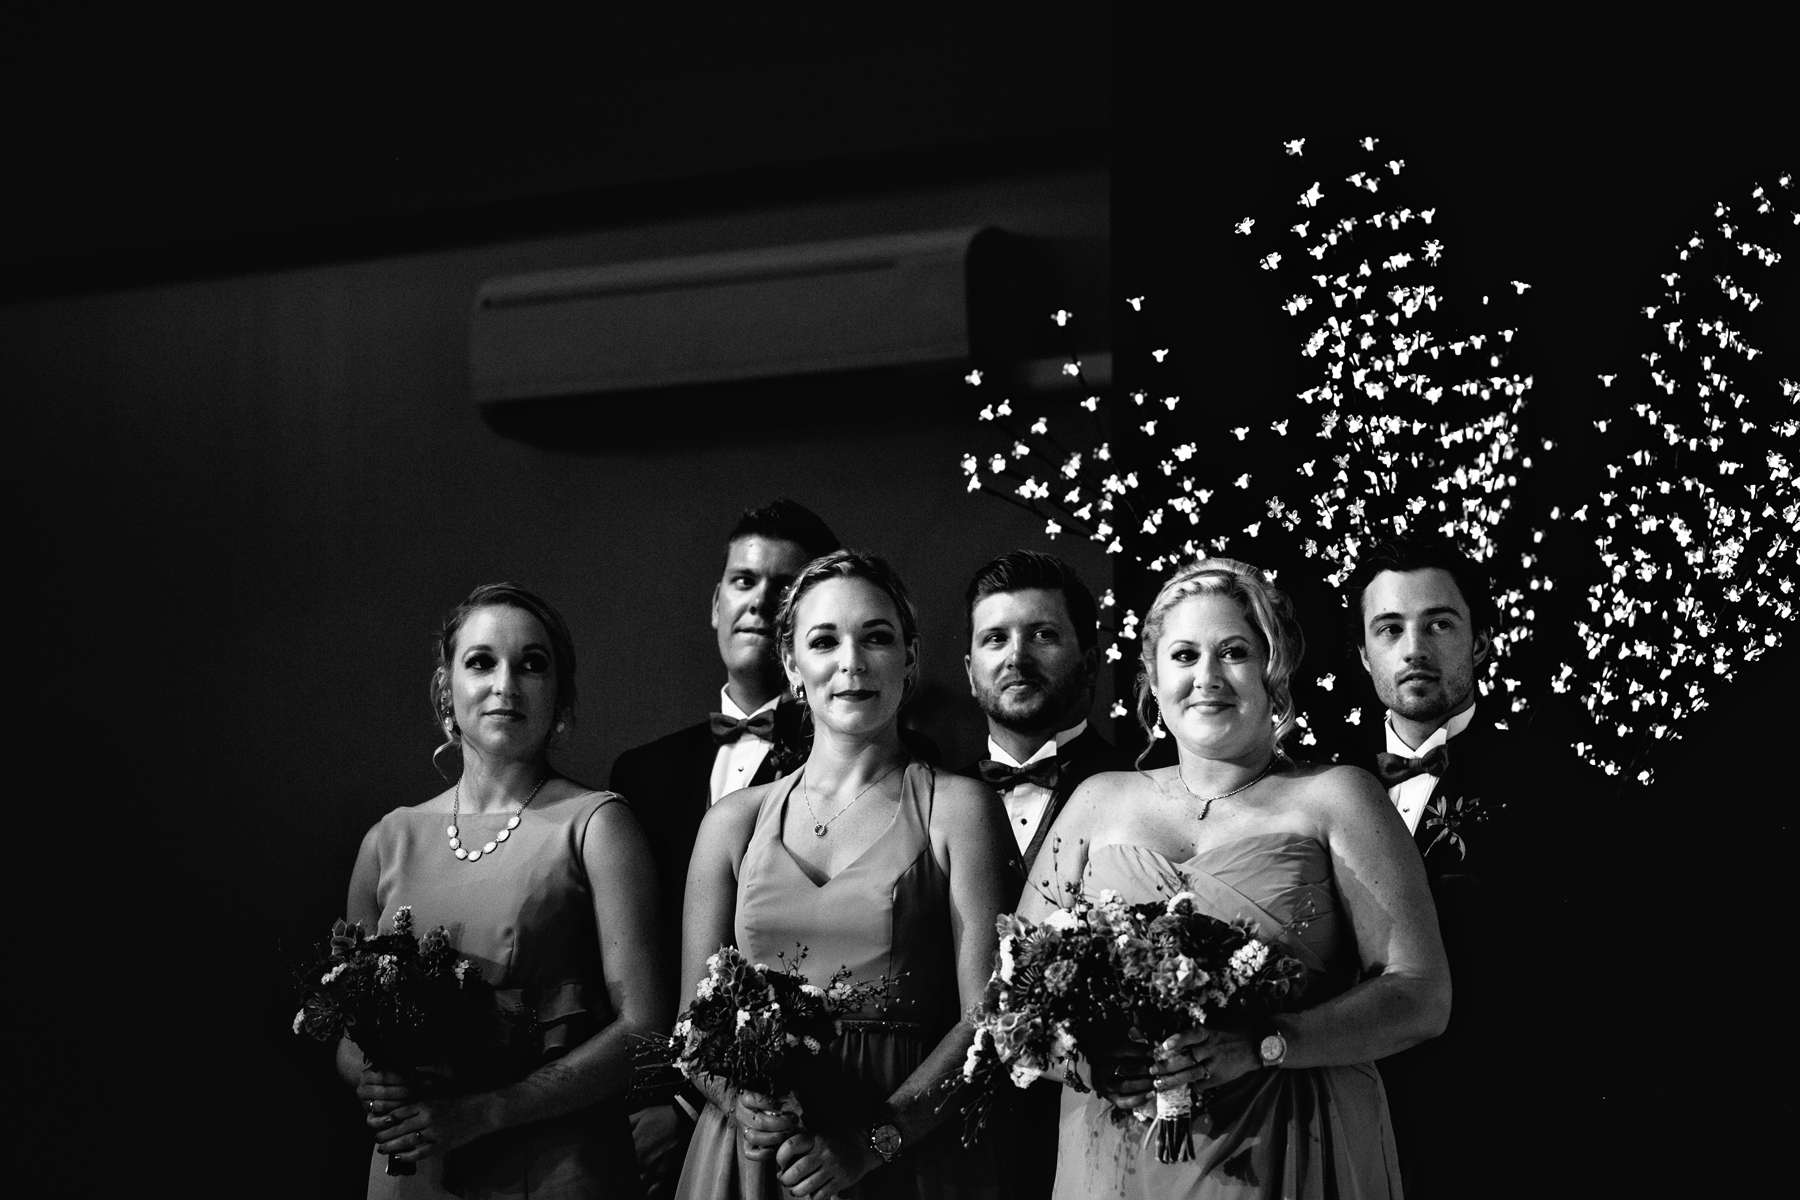 025-awesome-pei-wedding-photography-kandisebrown-jg2016